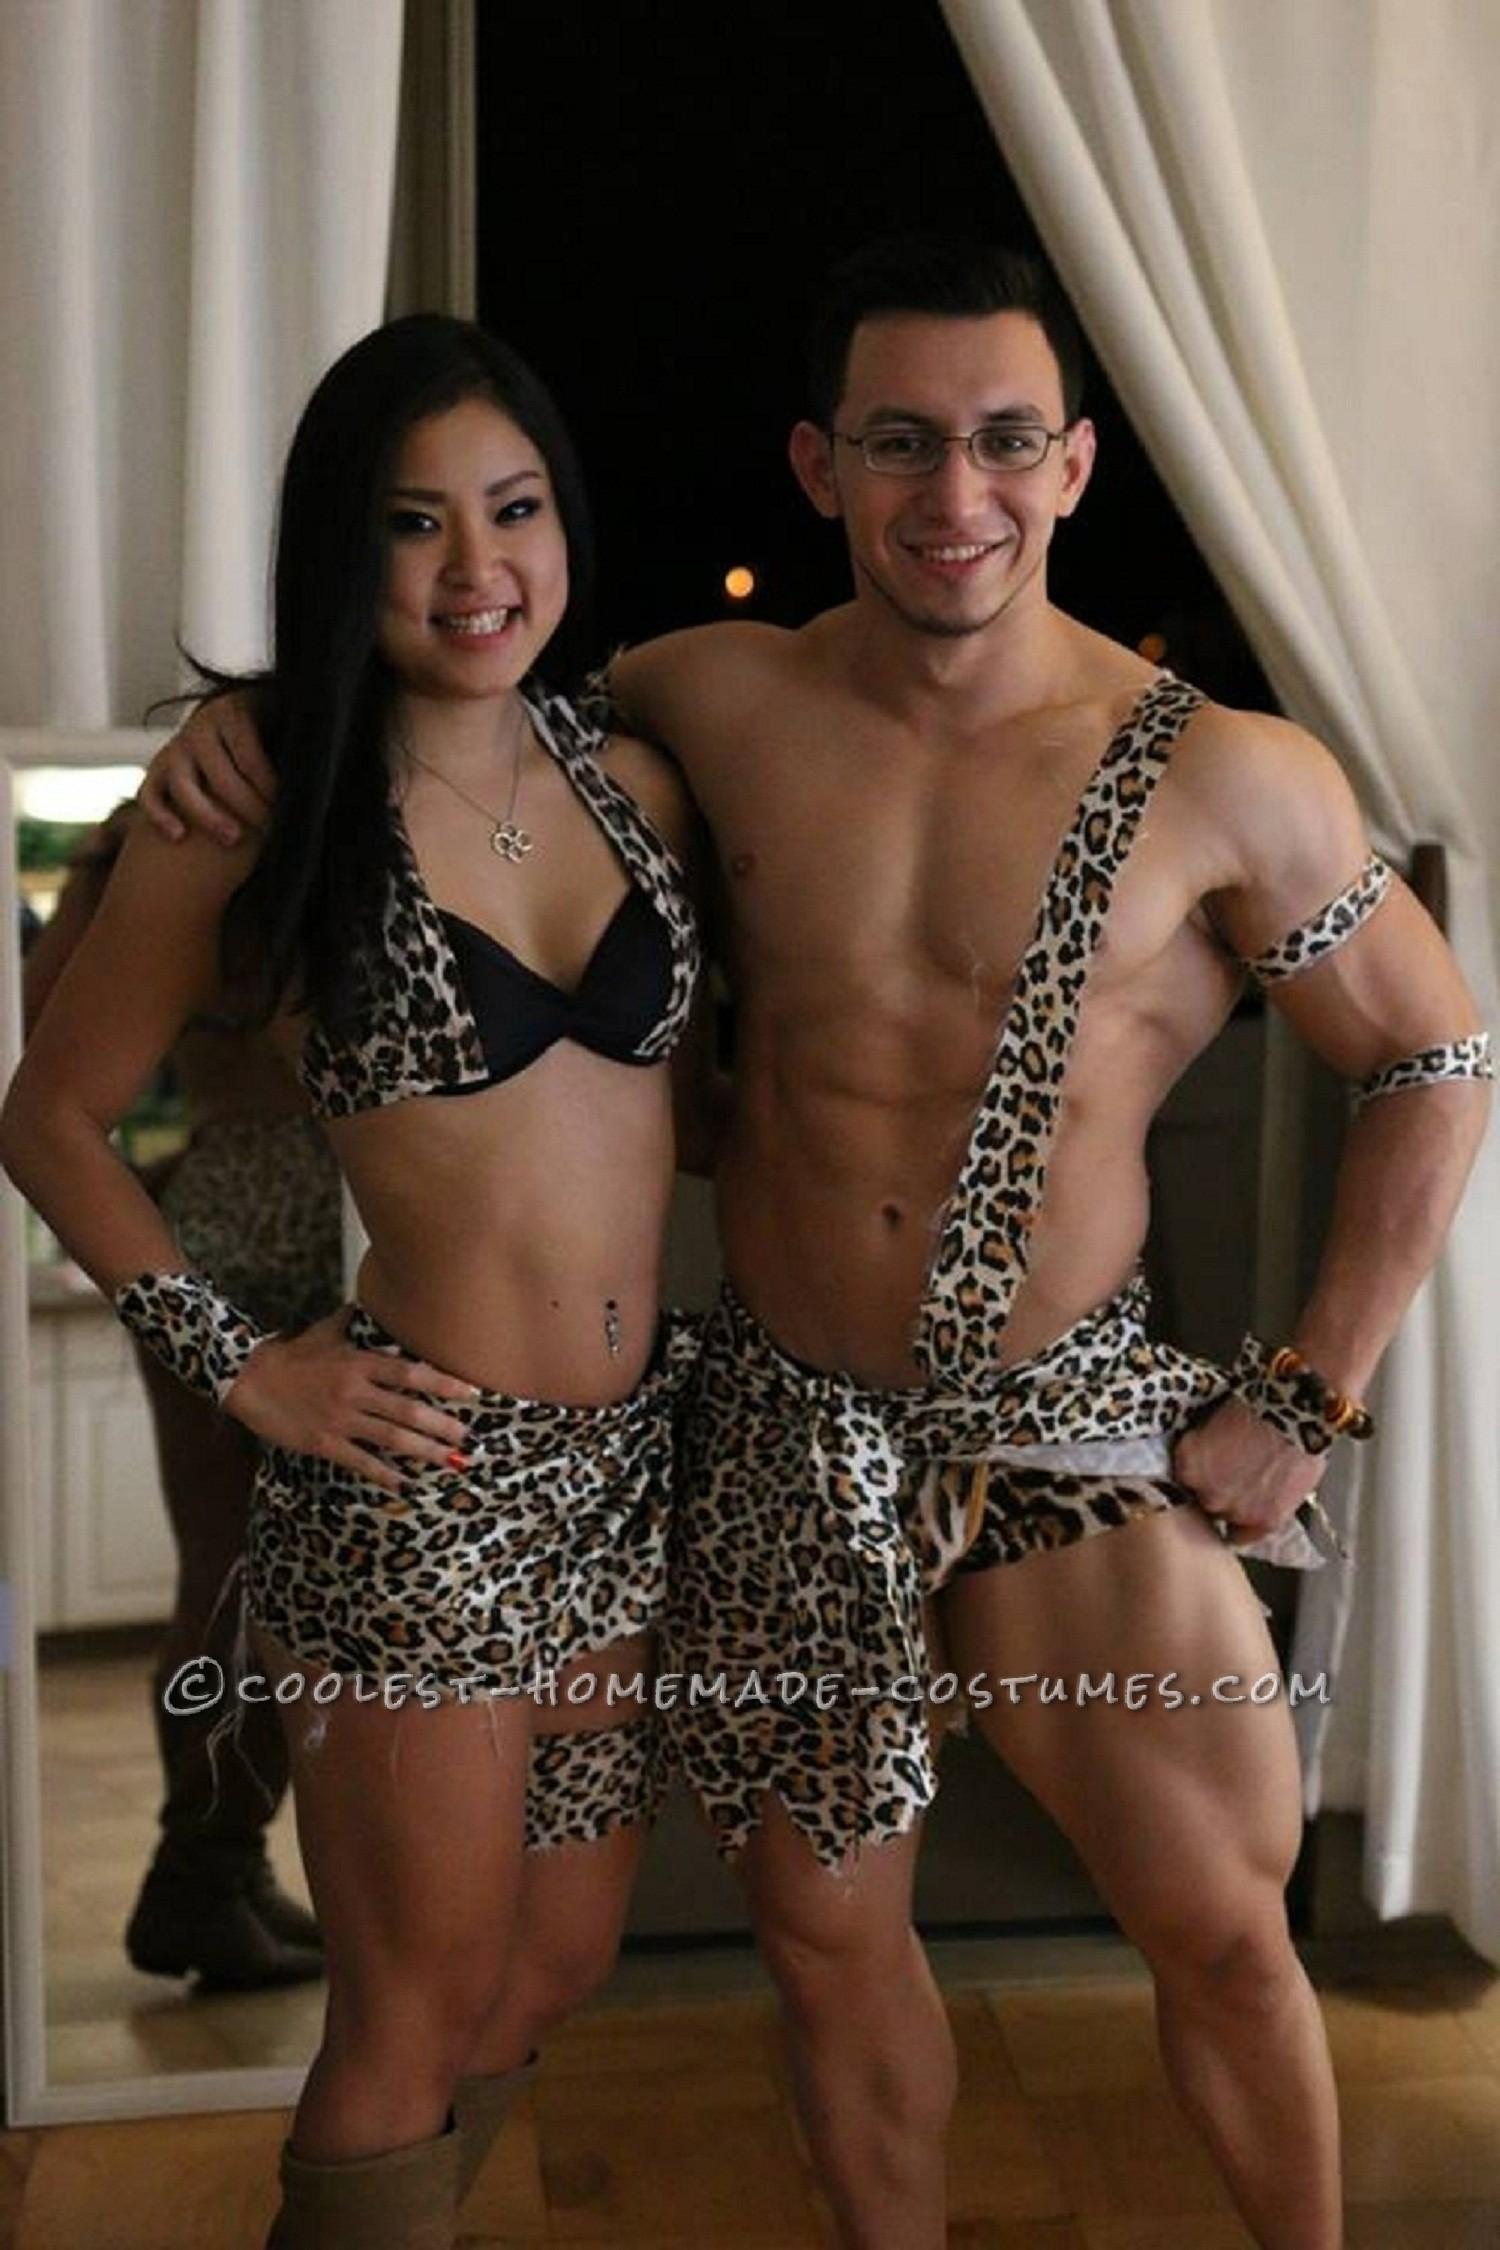 Bodybuilder Tarzan and Jane Couple Costume